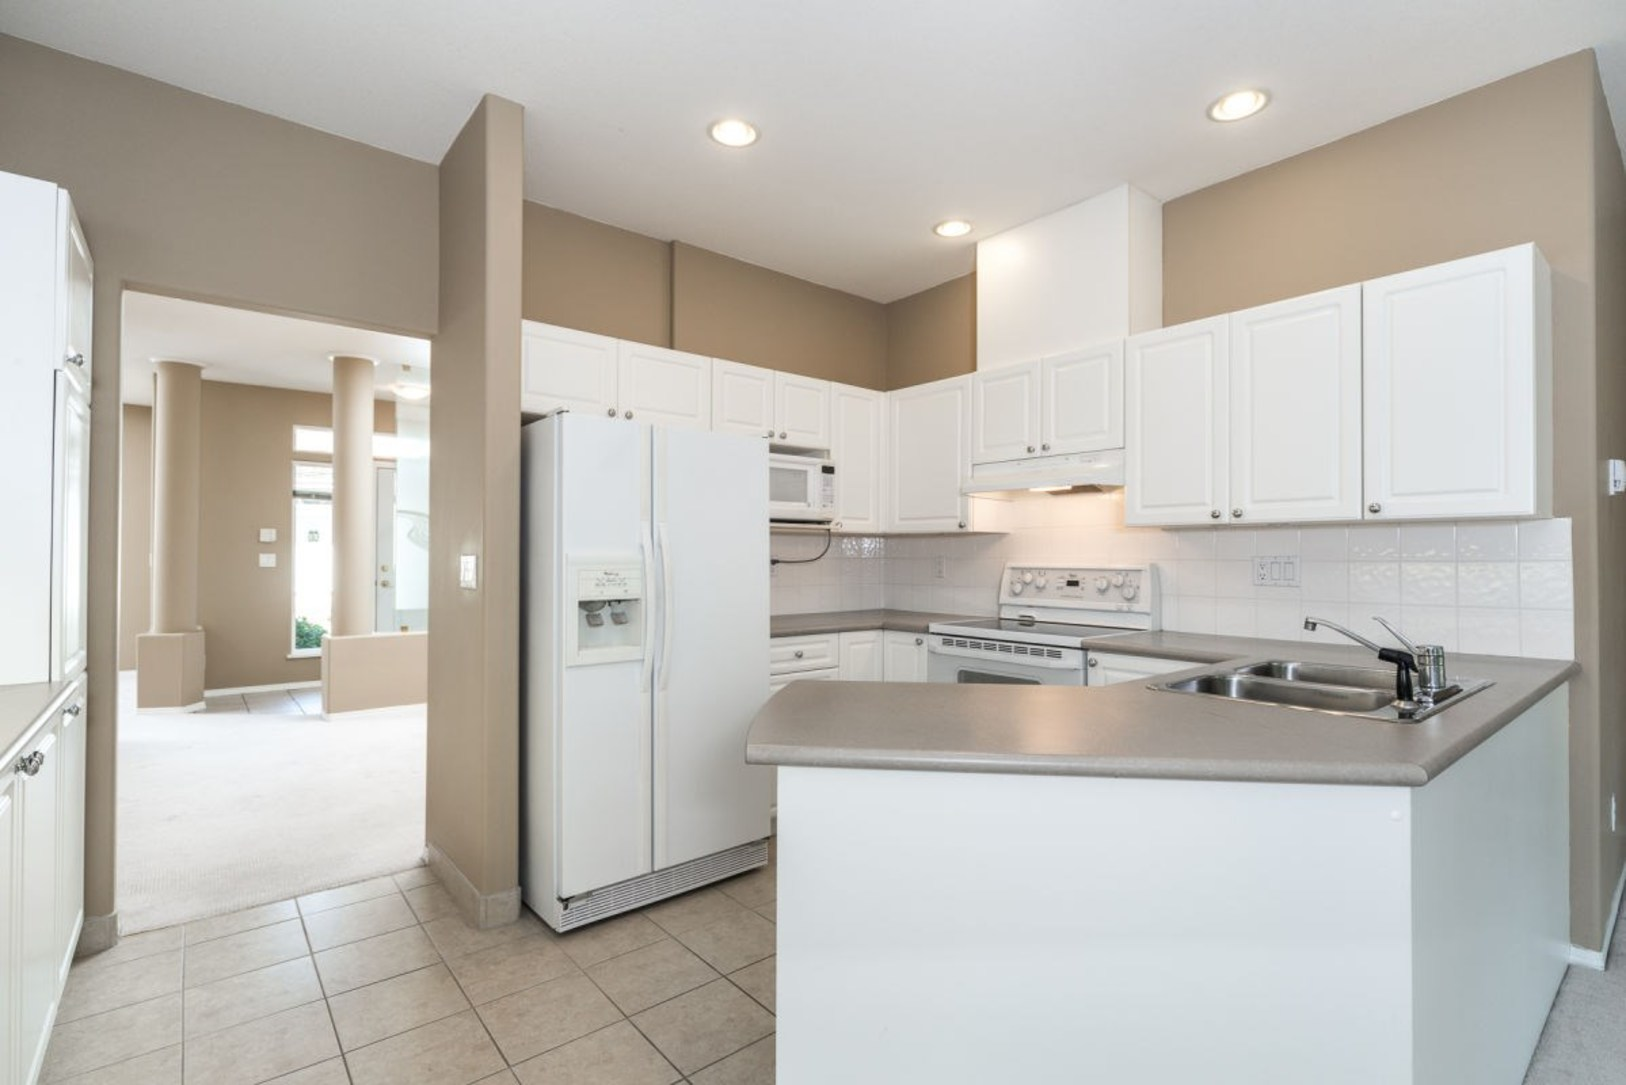 Kitchen at 19 - 20770 97b Avenue, Walnut Grove, Langley